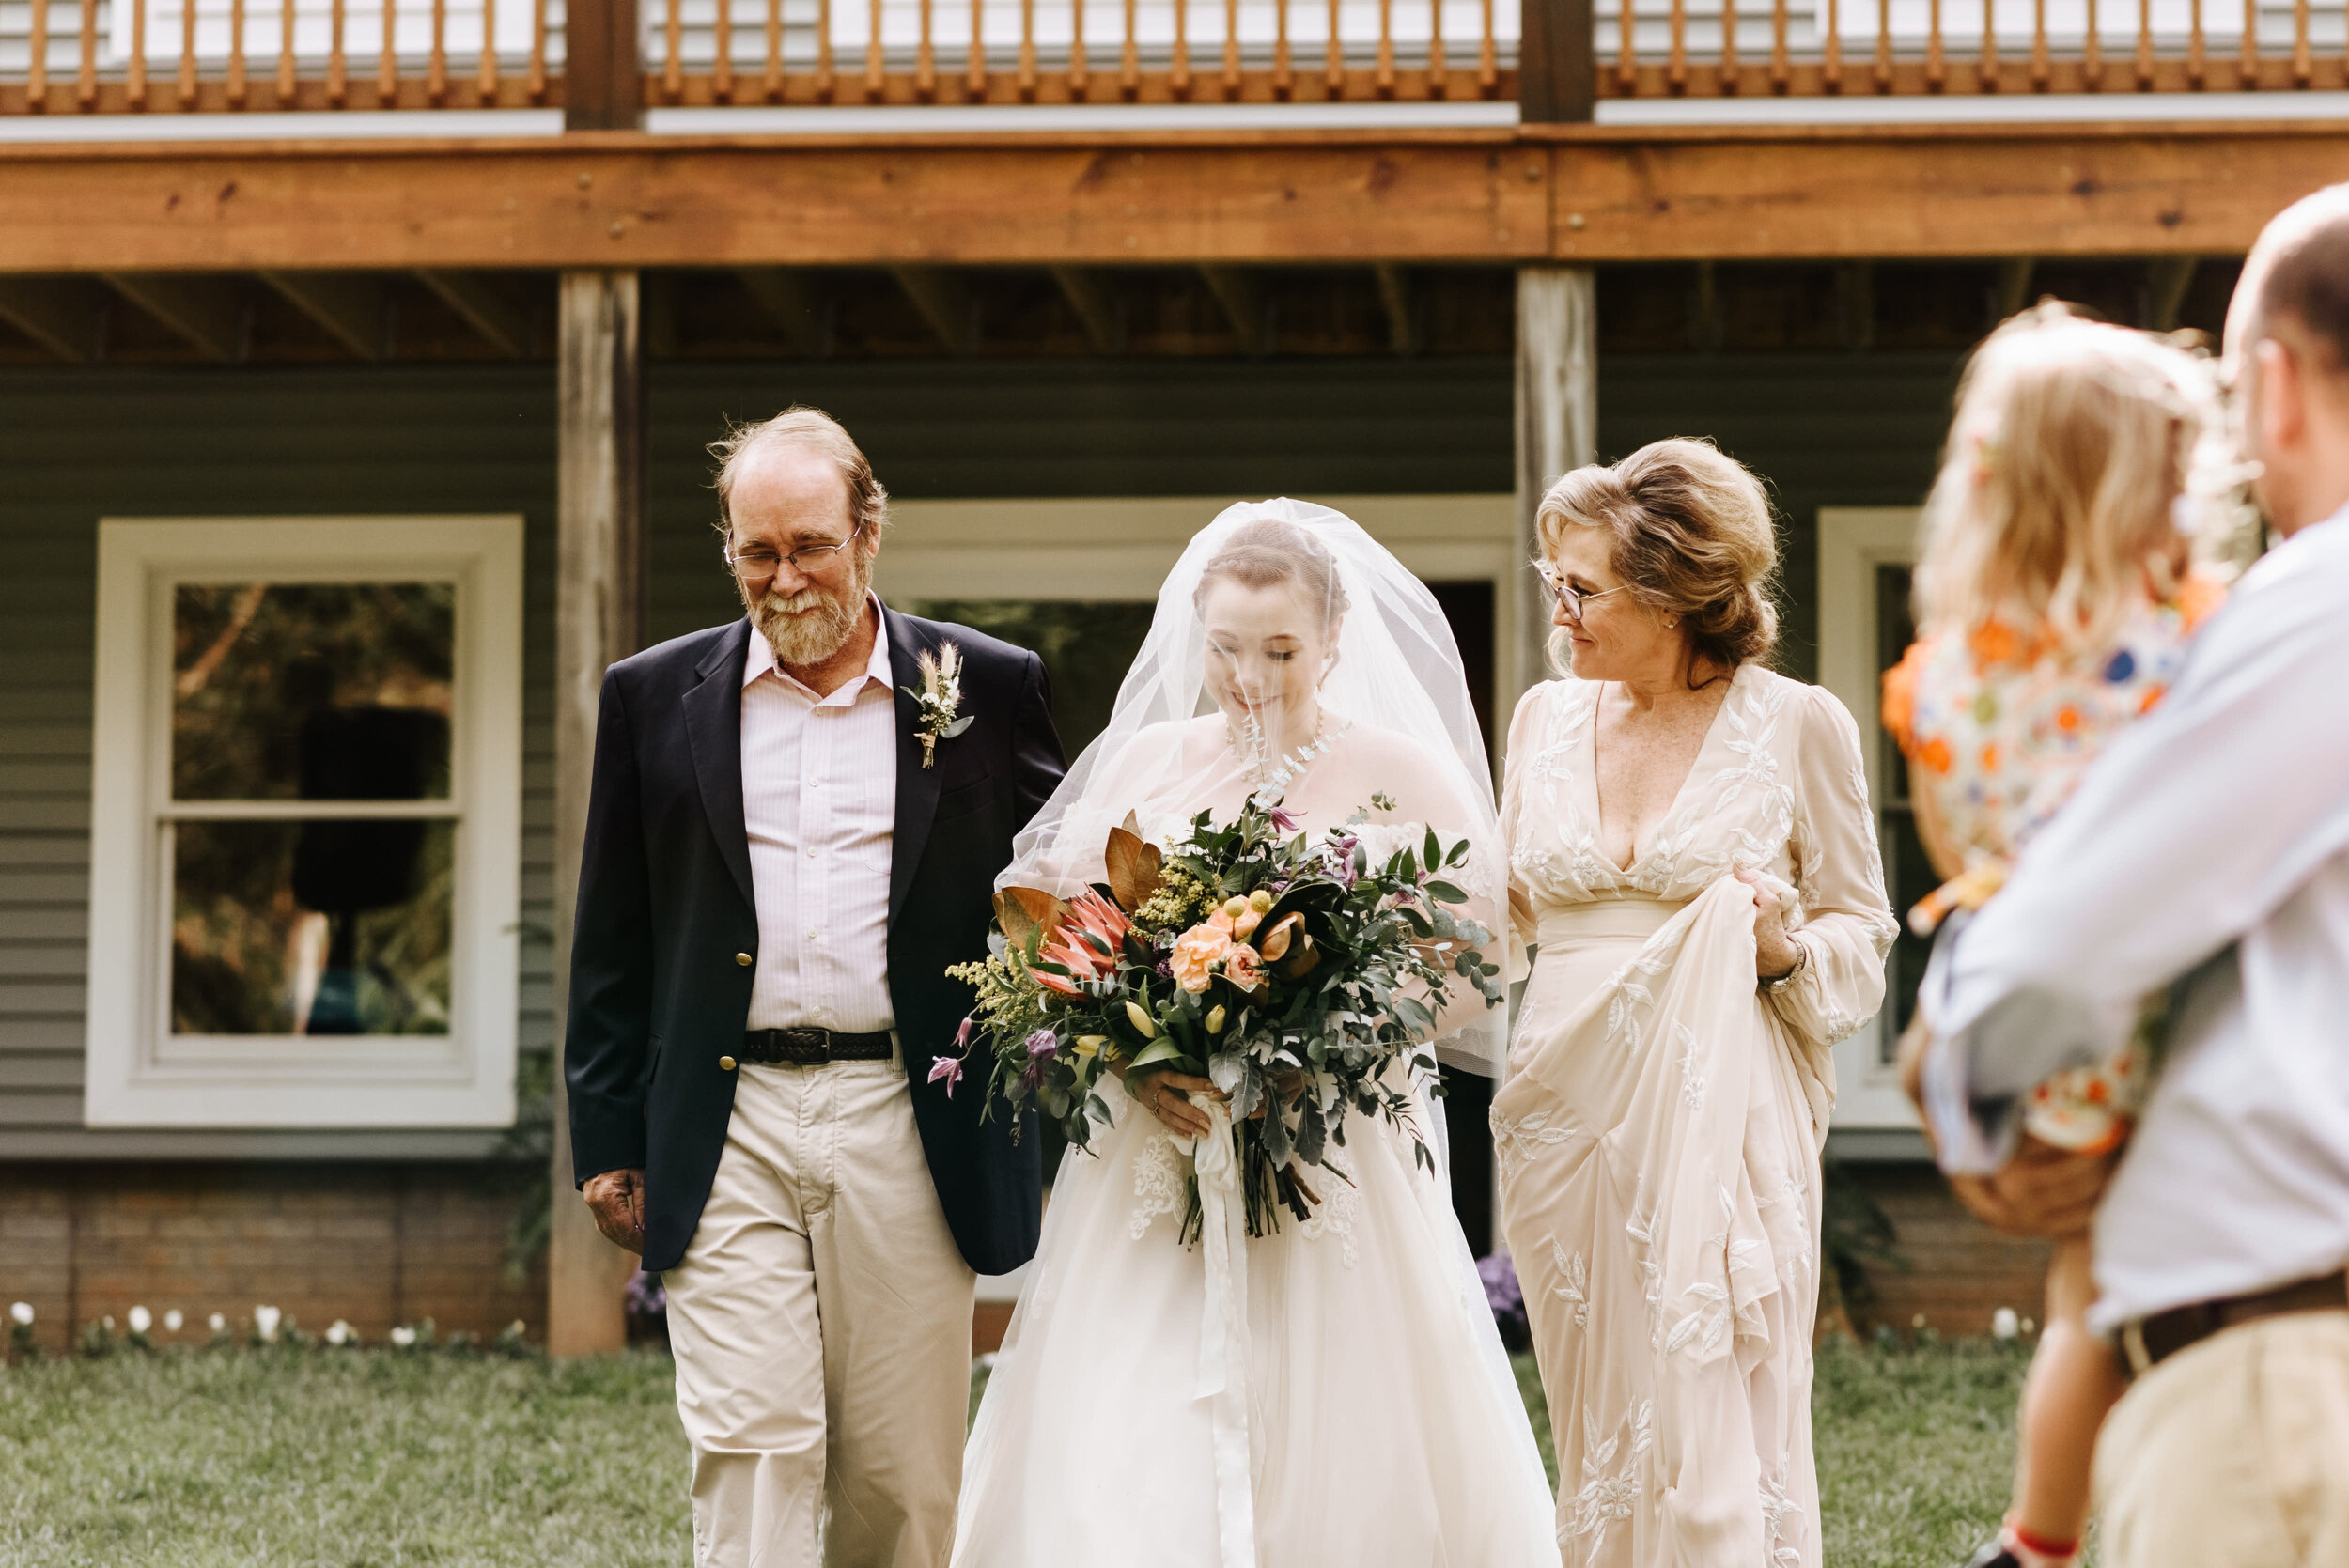 Rachel_David_Wedding_Richmond_Virginia_Photography_by_V_21.jpg